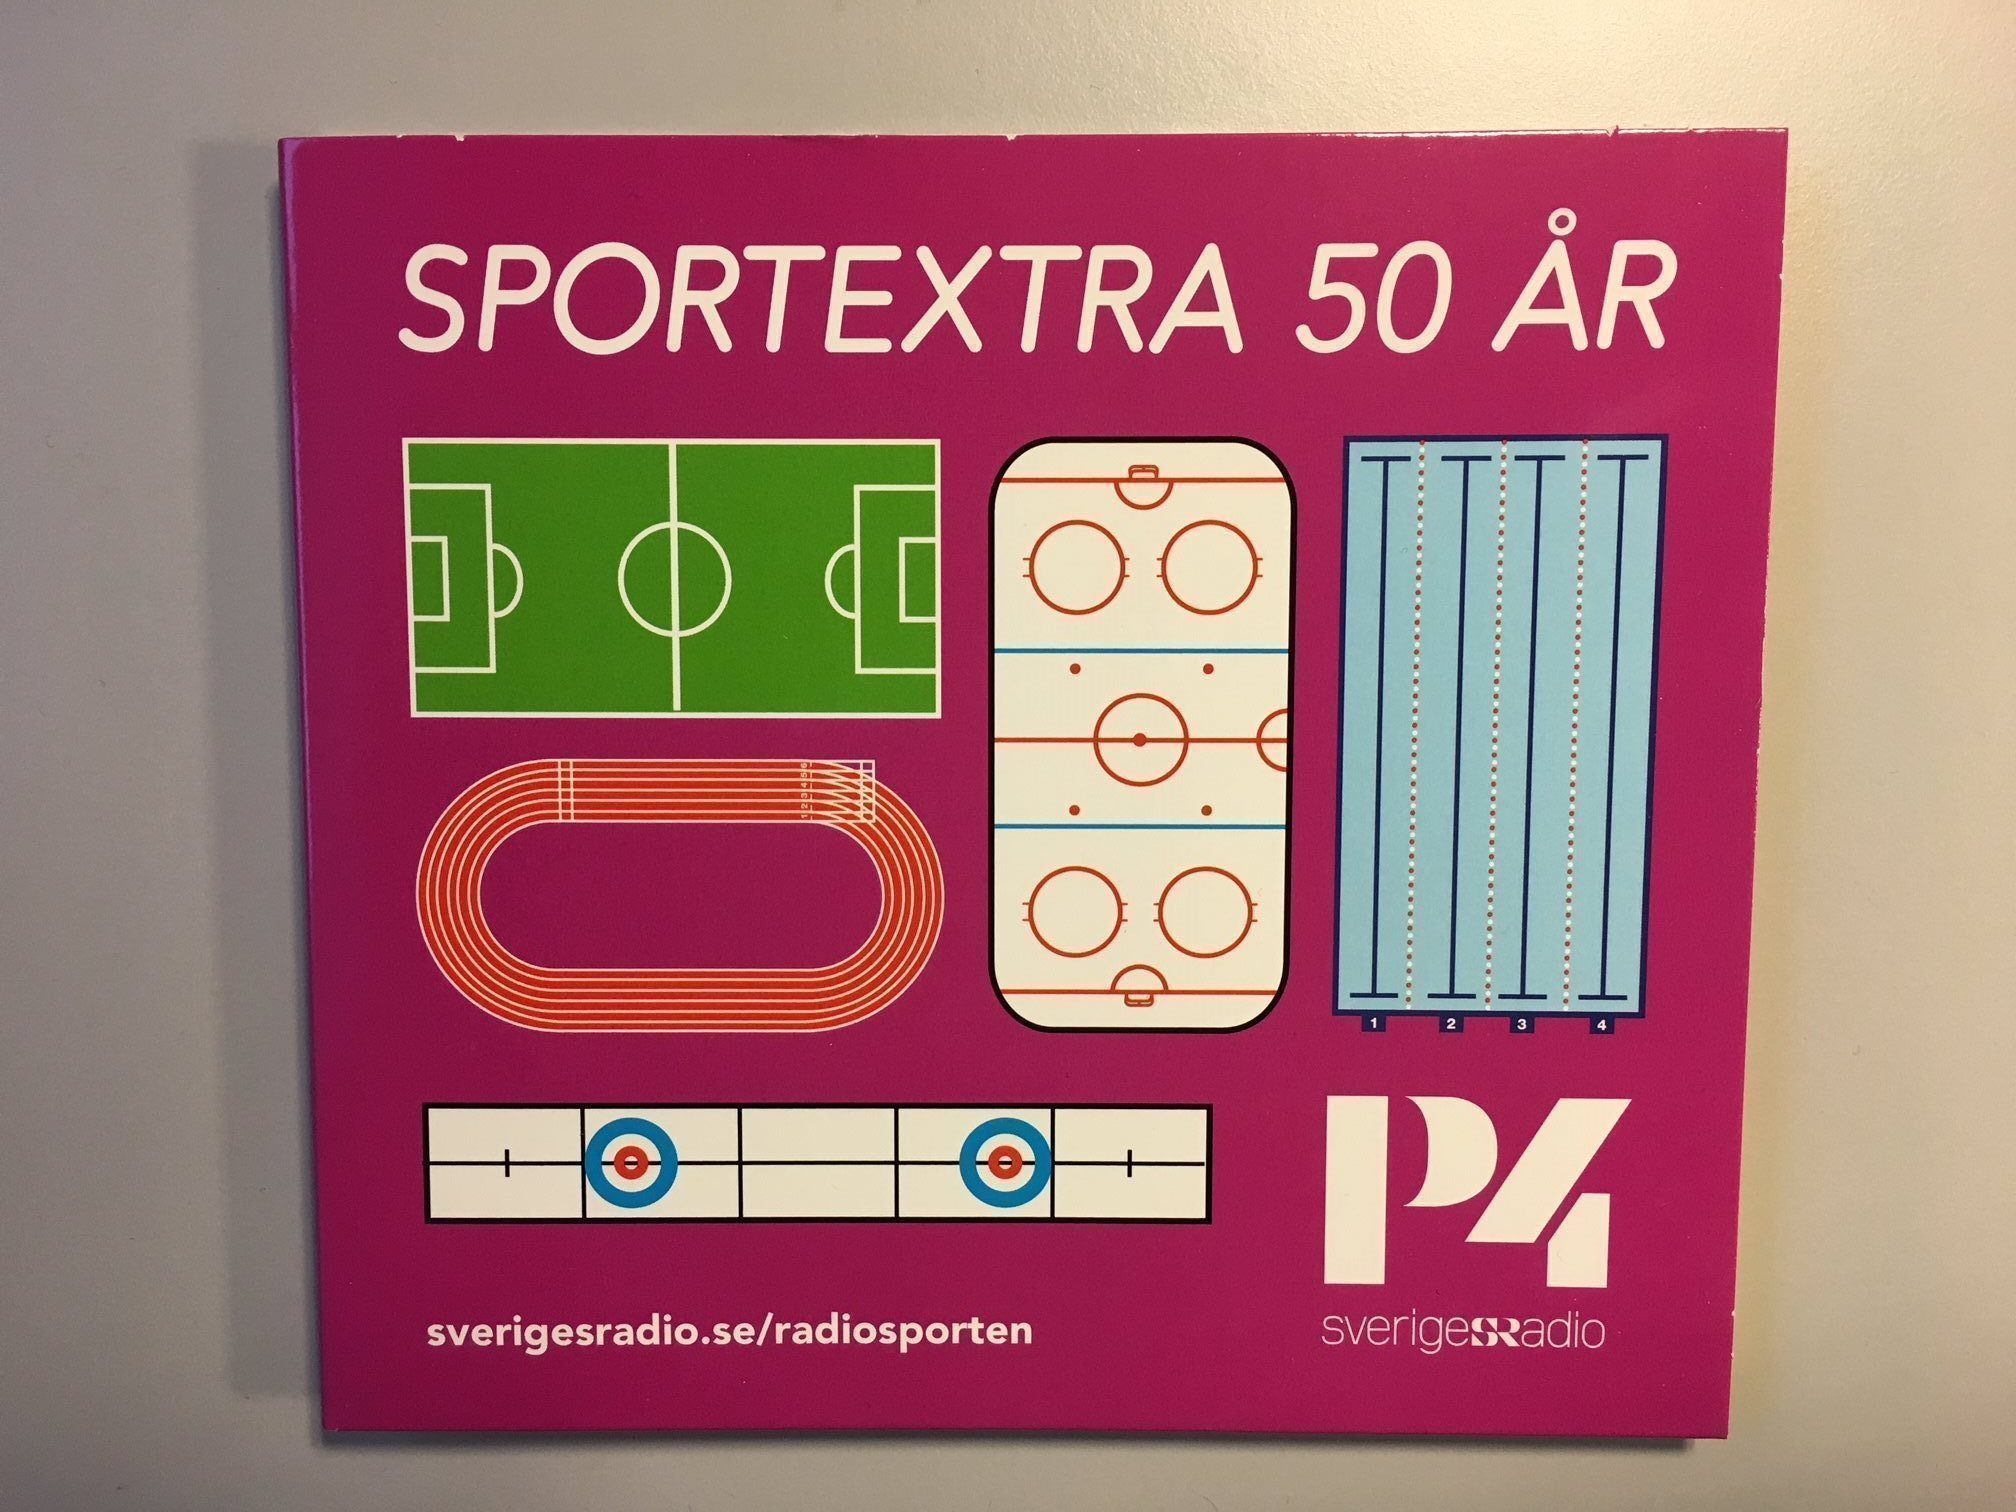 sportextra 50 år Sportextra CD   Radiosporten P4 Sveriges Ra.. (315163573) ᐈ Köp  sportextra 50 år